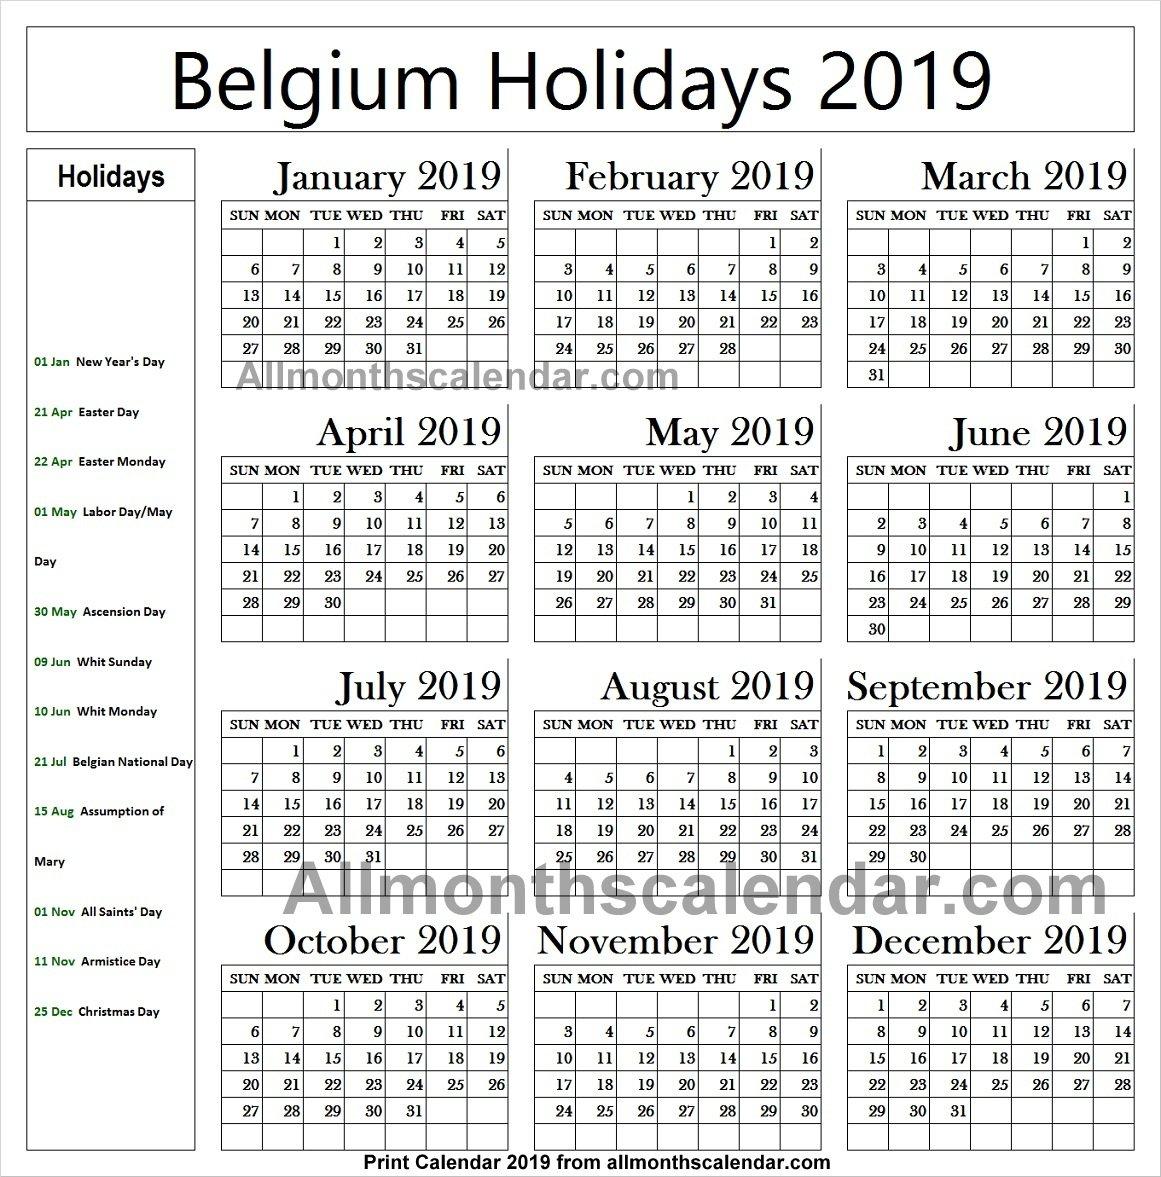 Belgium Holiday List 2019 Calendar | 2019 Belgium Calendar Calendar 2019 Belgium